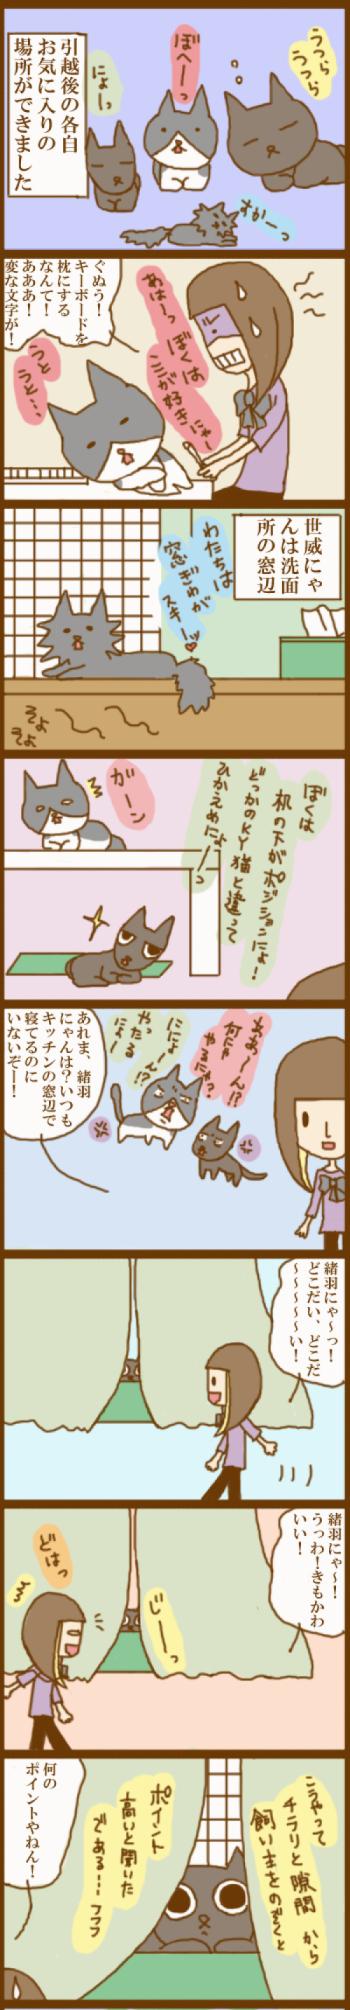 f:id:suzuokayu:20201118104040j:plain